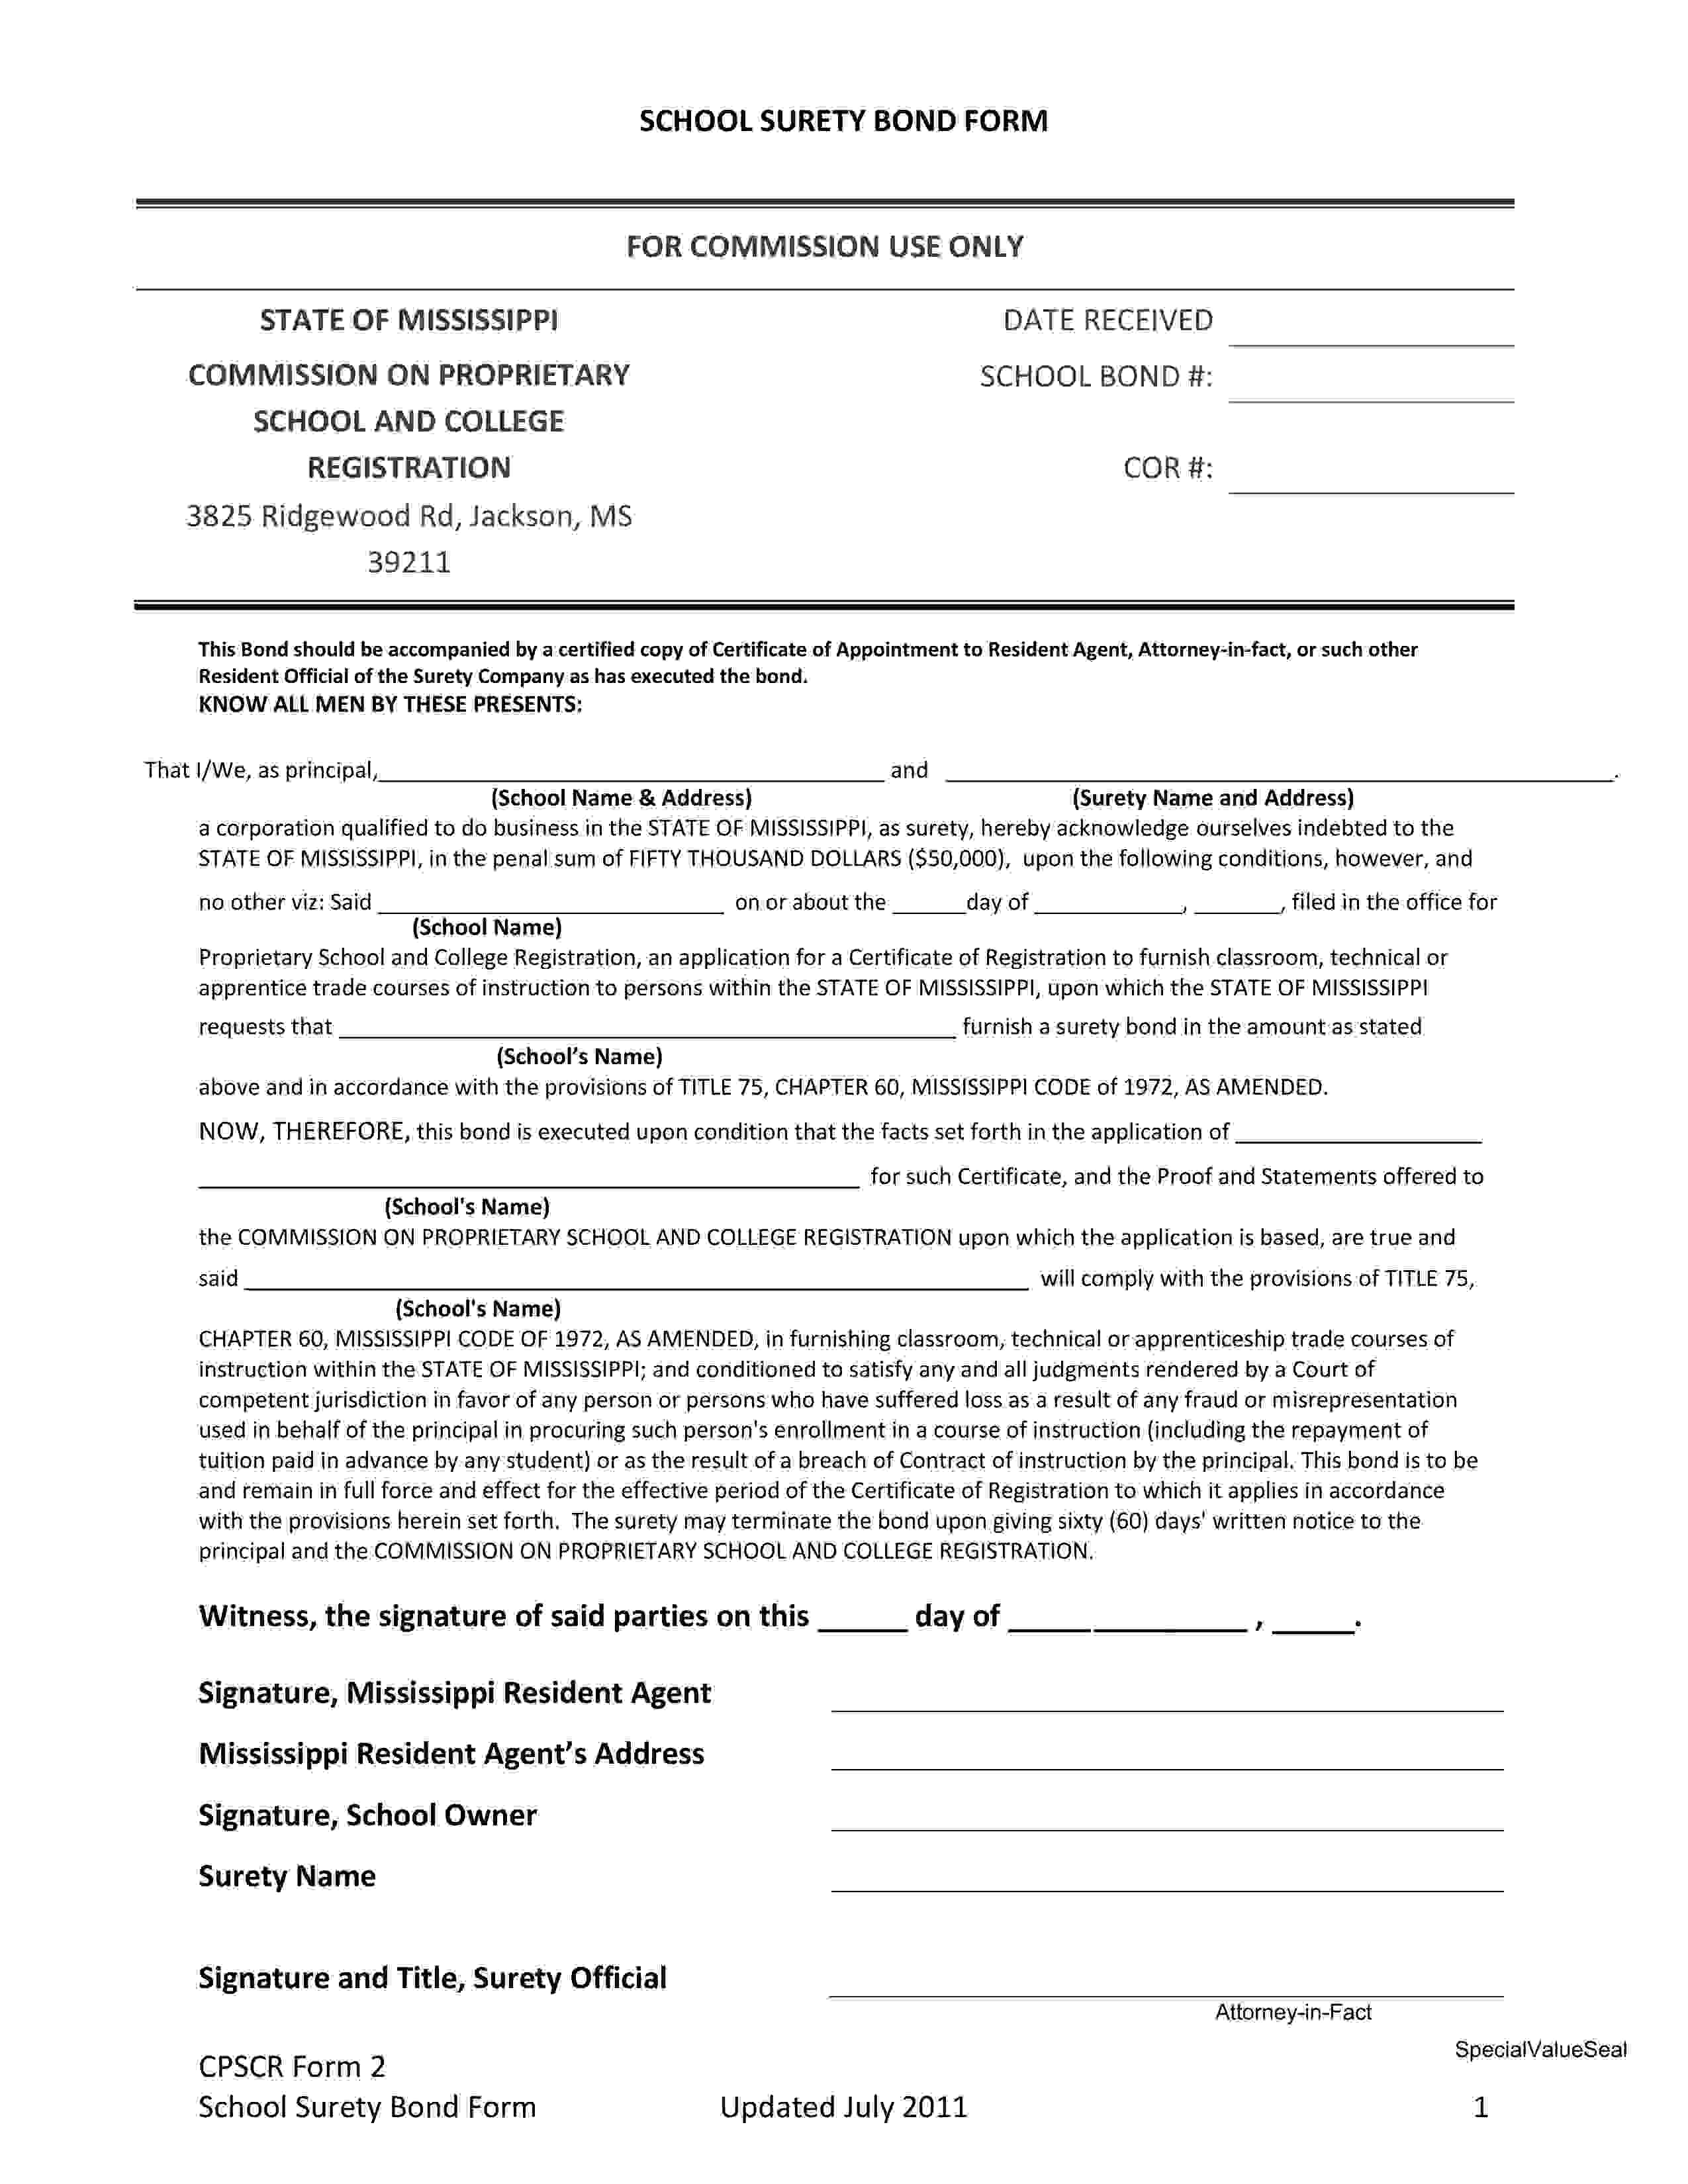 Mississippi Commission on Proprietary School and College Registration Proprietary School & College Registration Bond sample image